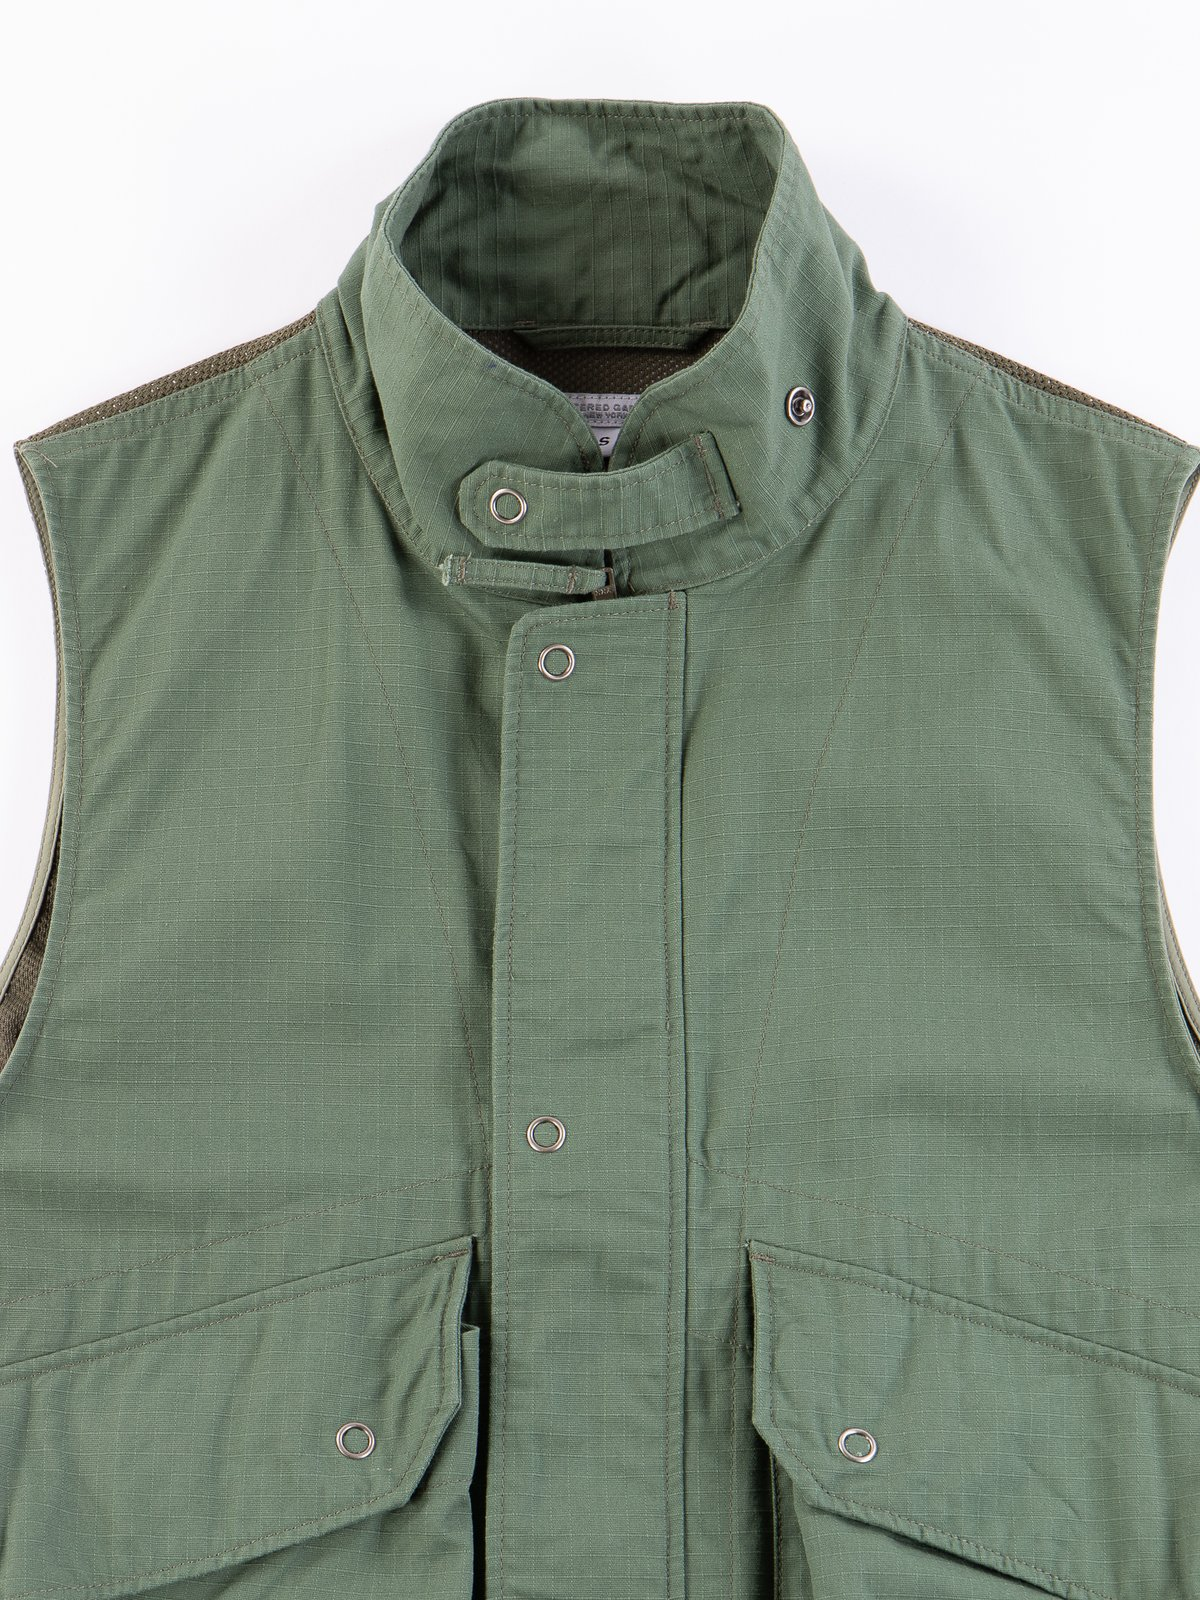 Olive Cotton Ripstop Field Vest - Image 3